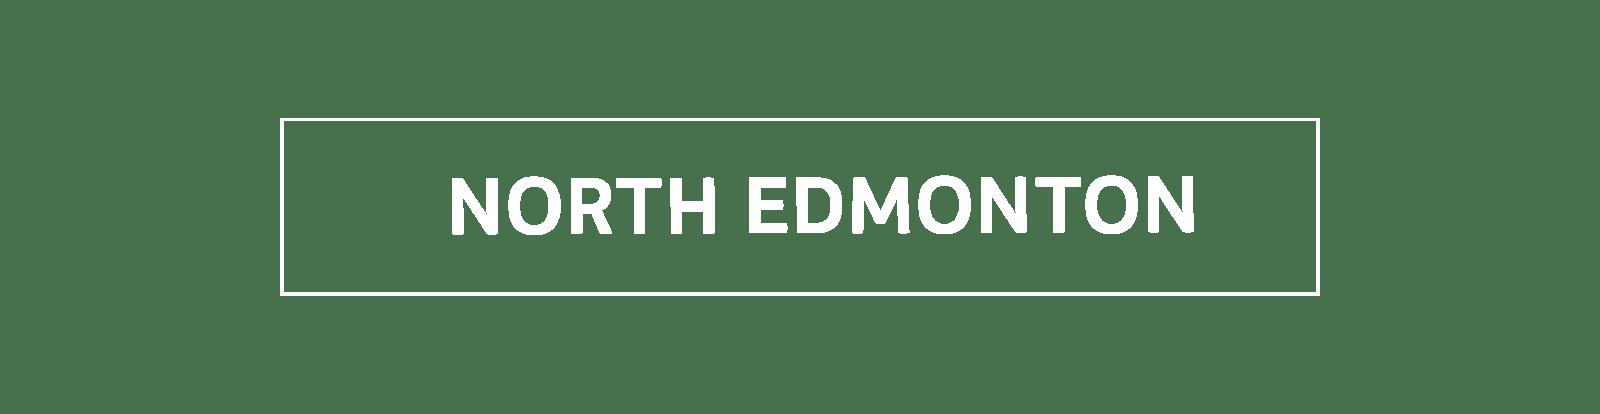 NORTH EDMONTON